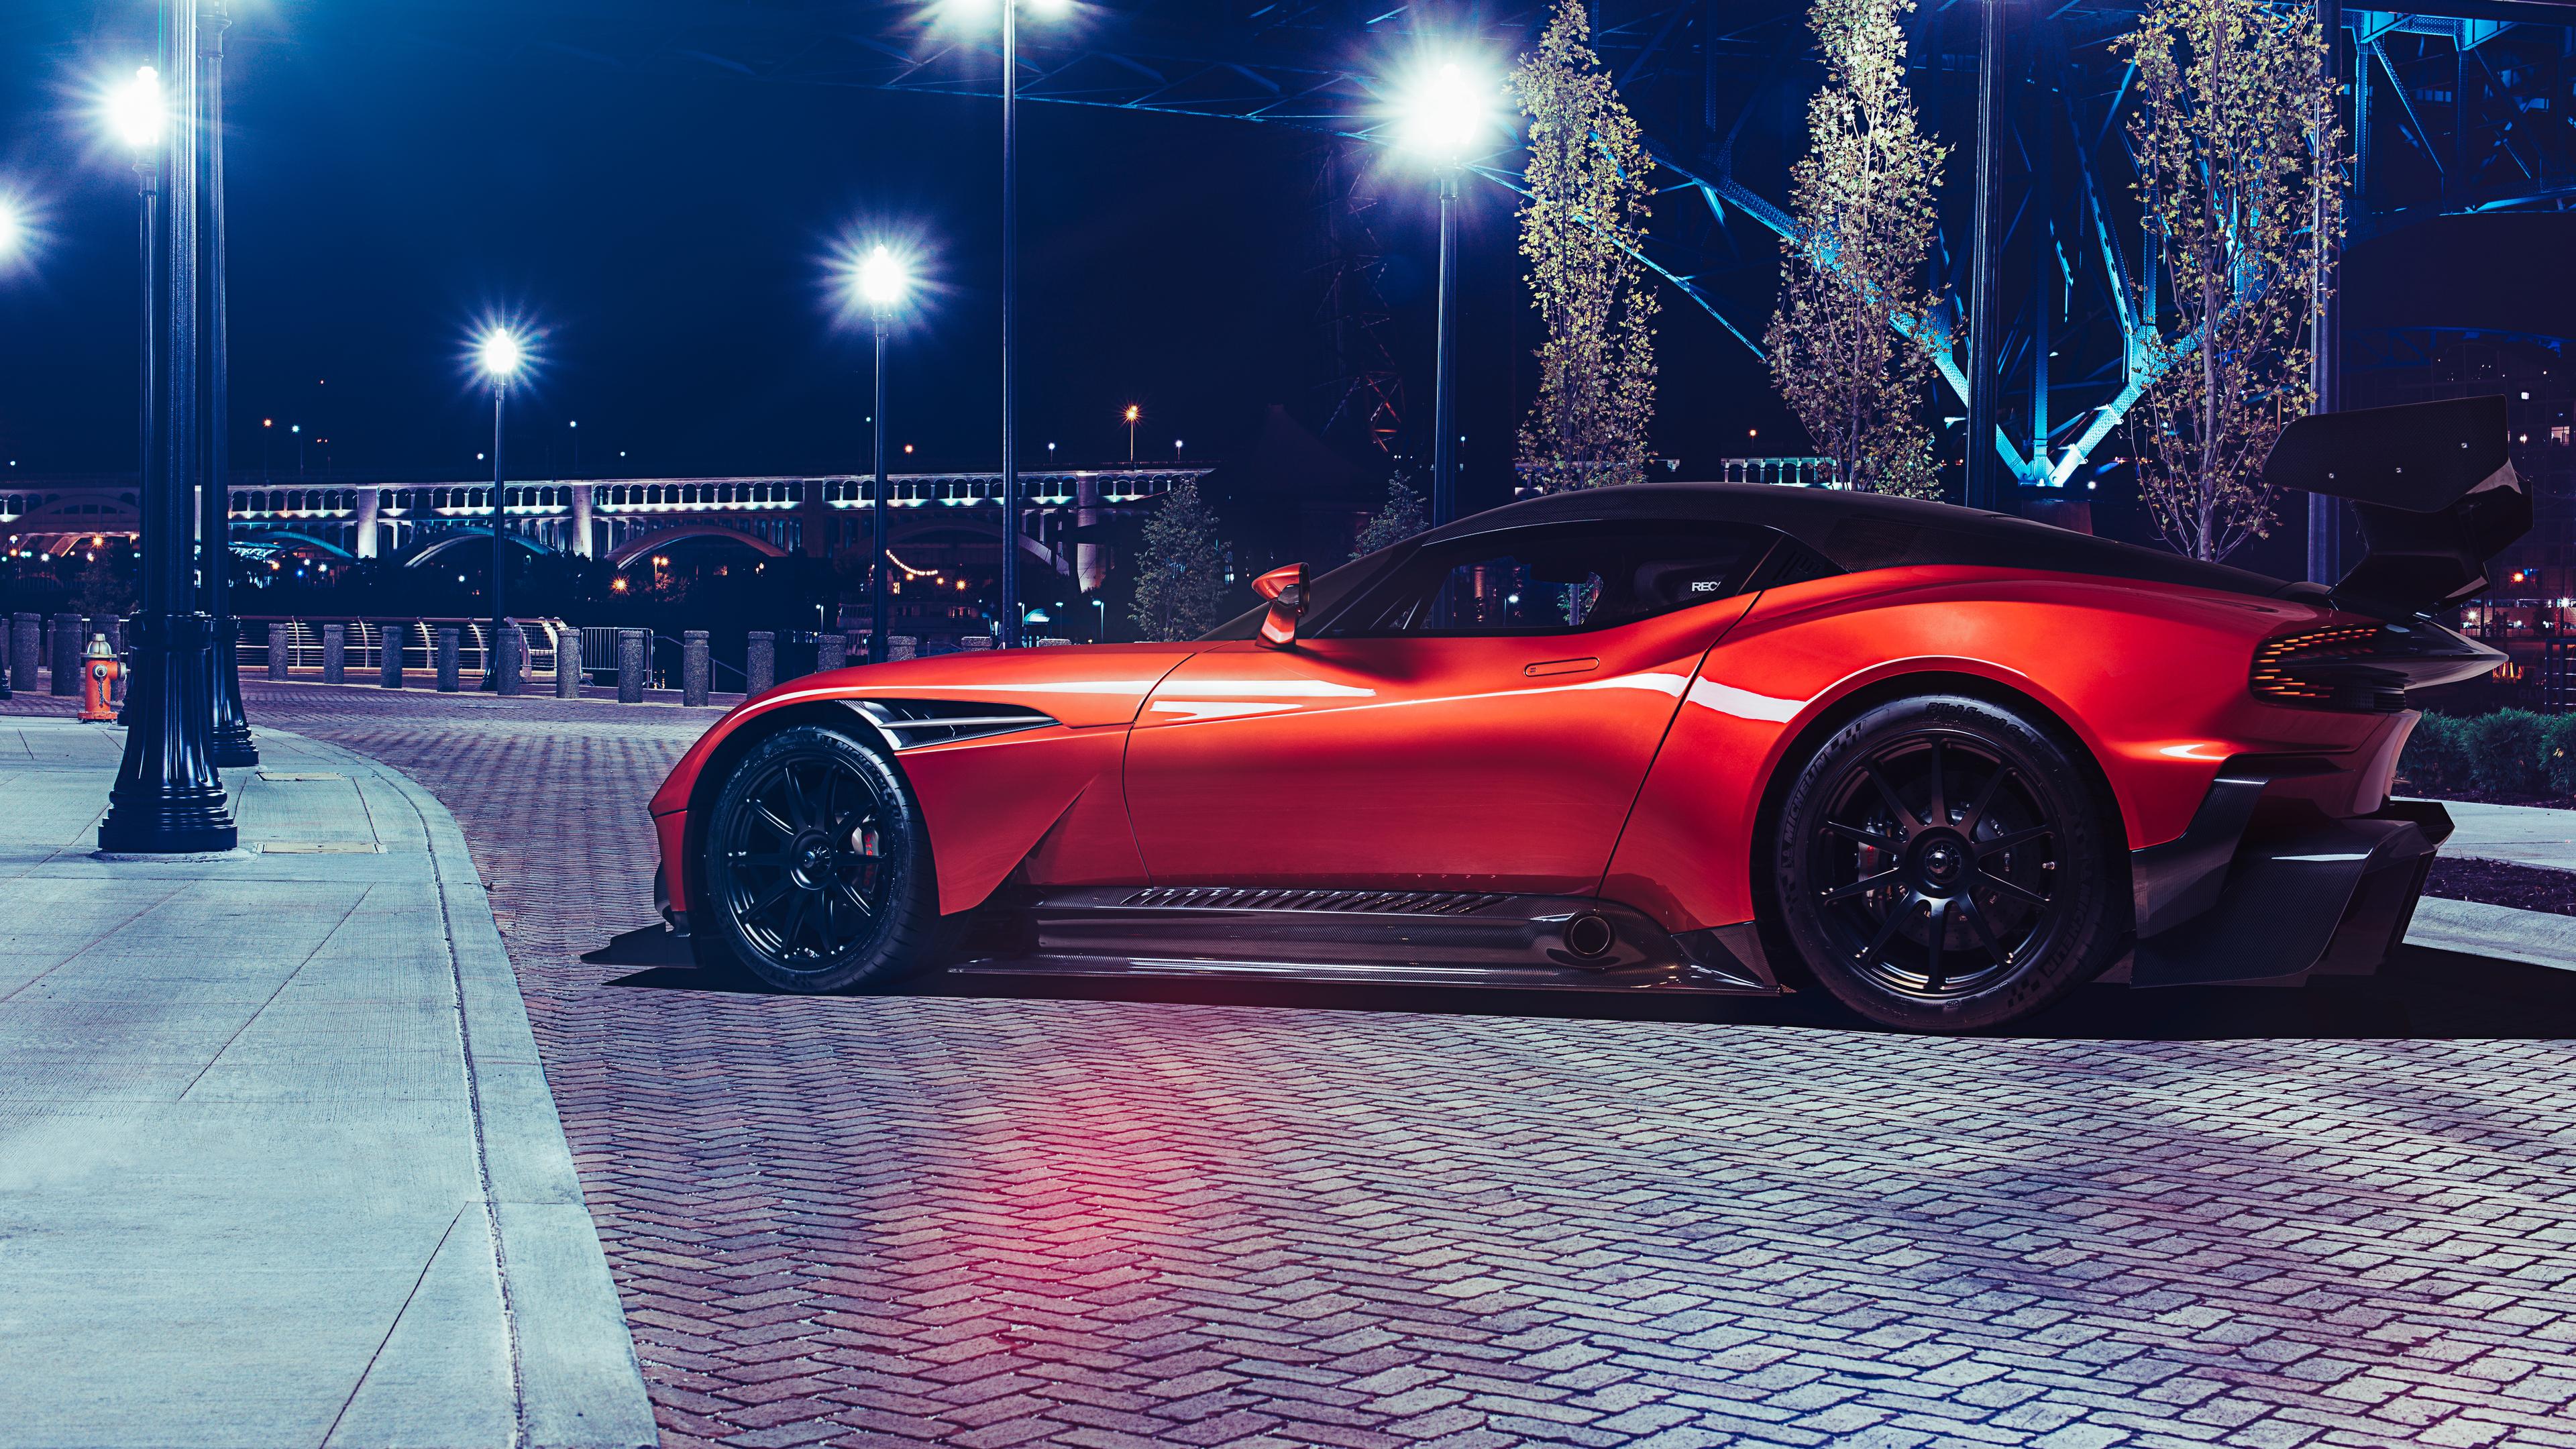 aston martin vulcan x 4k 1556185319 - Aston Martin Vulcan X 4k - hd-wallpapers, cars wallpapers, aston martin wallpapers, aston martin vulcan amr pro wallpapers, 5k wallpapers, 4k-wallpapers, 2019 cars wallpapers